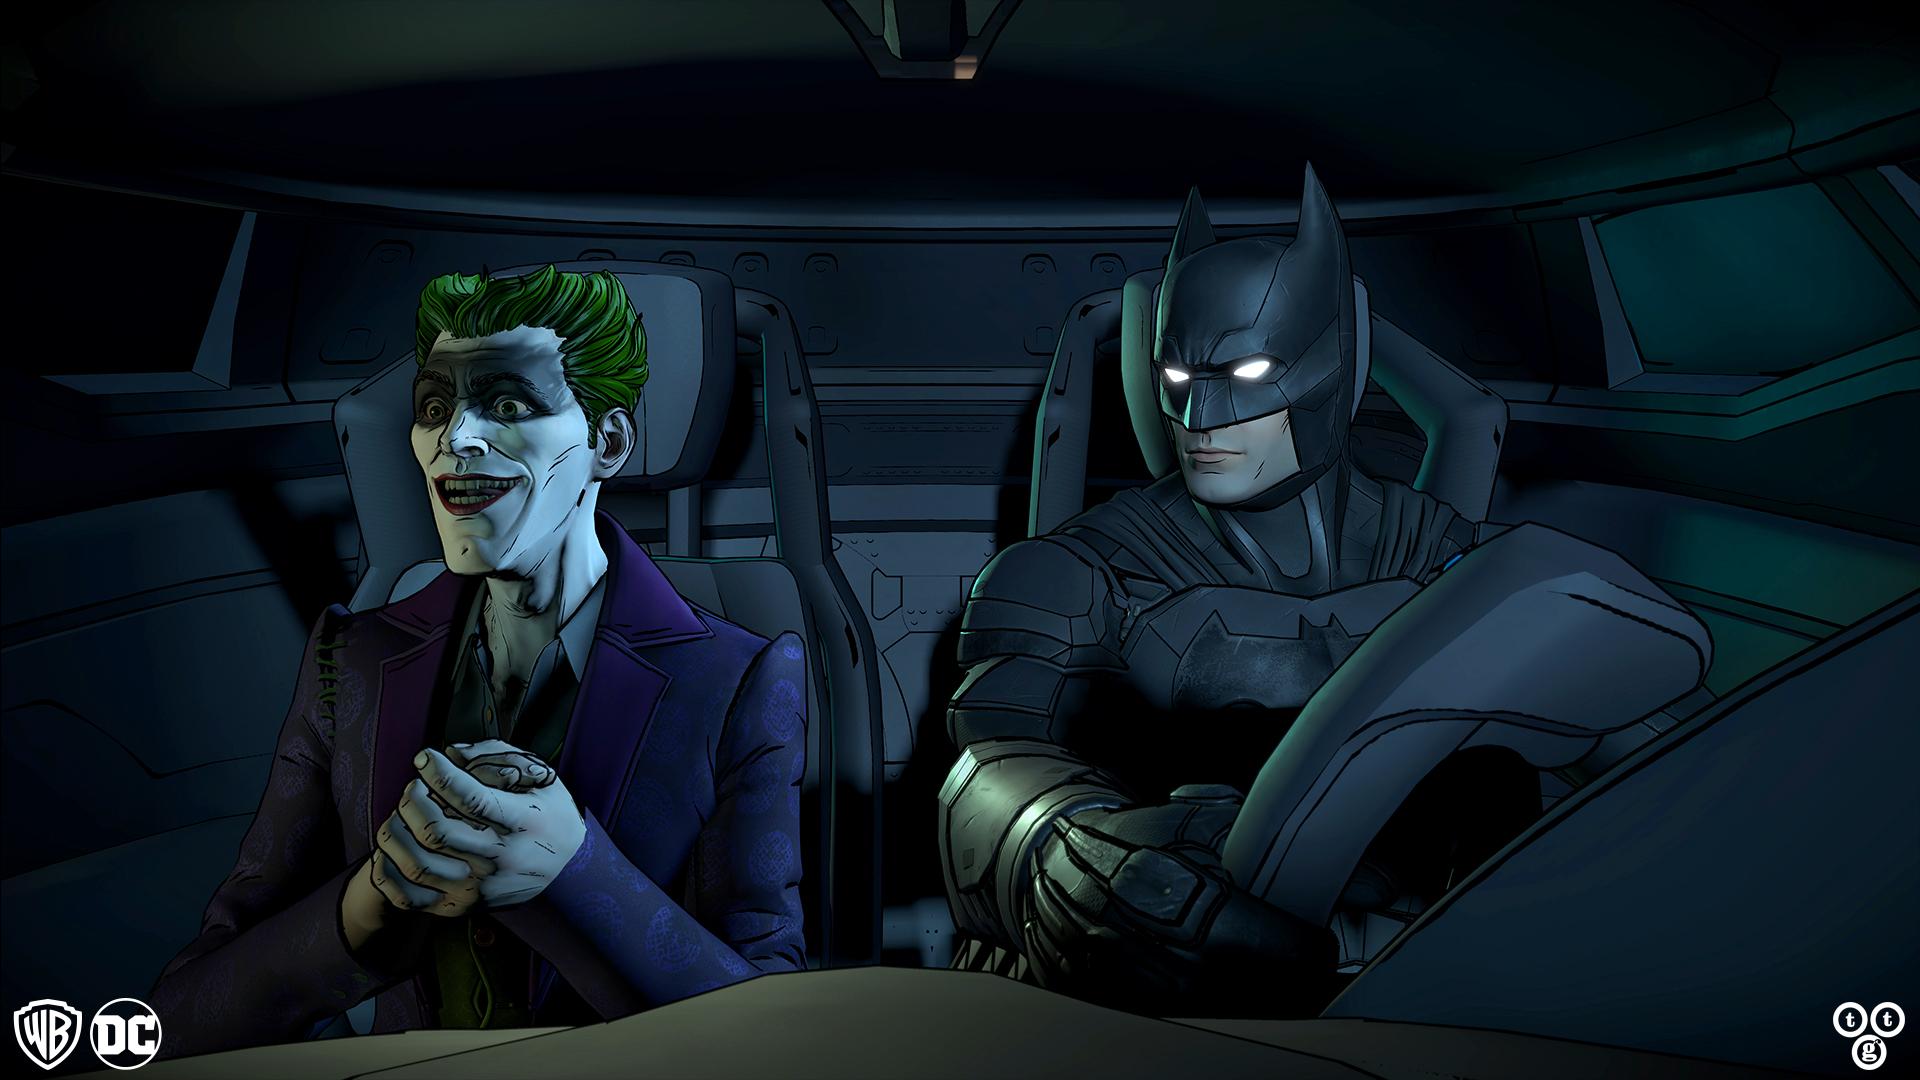 The Joker Animated Wallpaper The Batman Universe Final Season Episode Of Telltale S